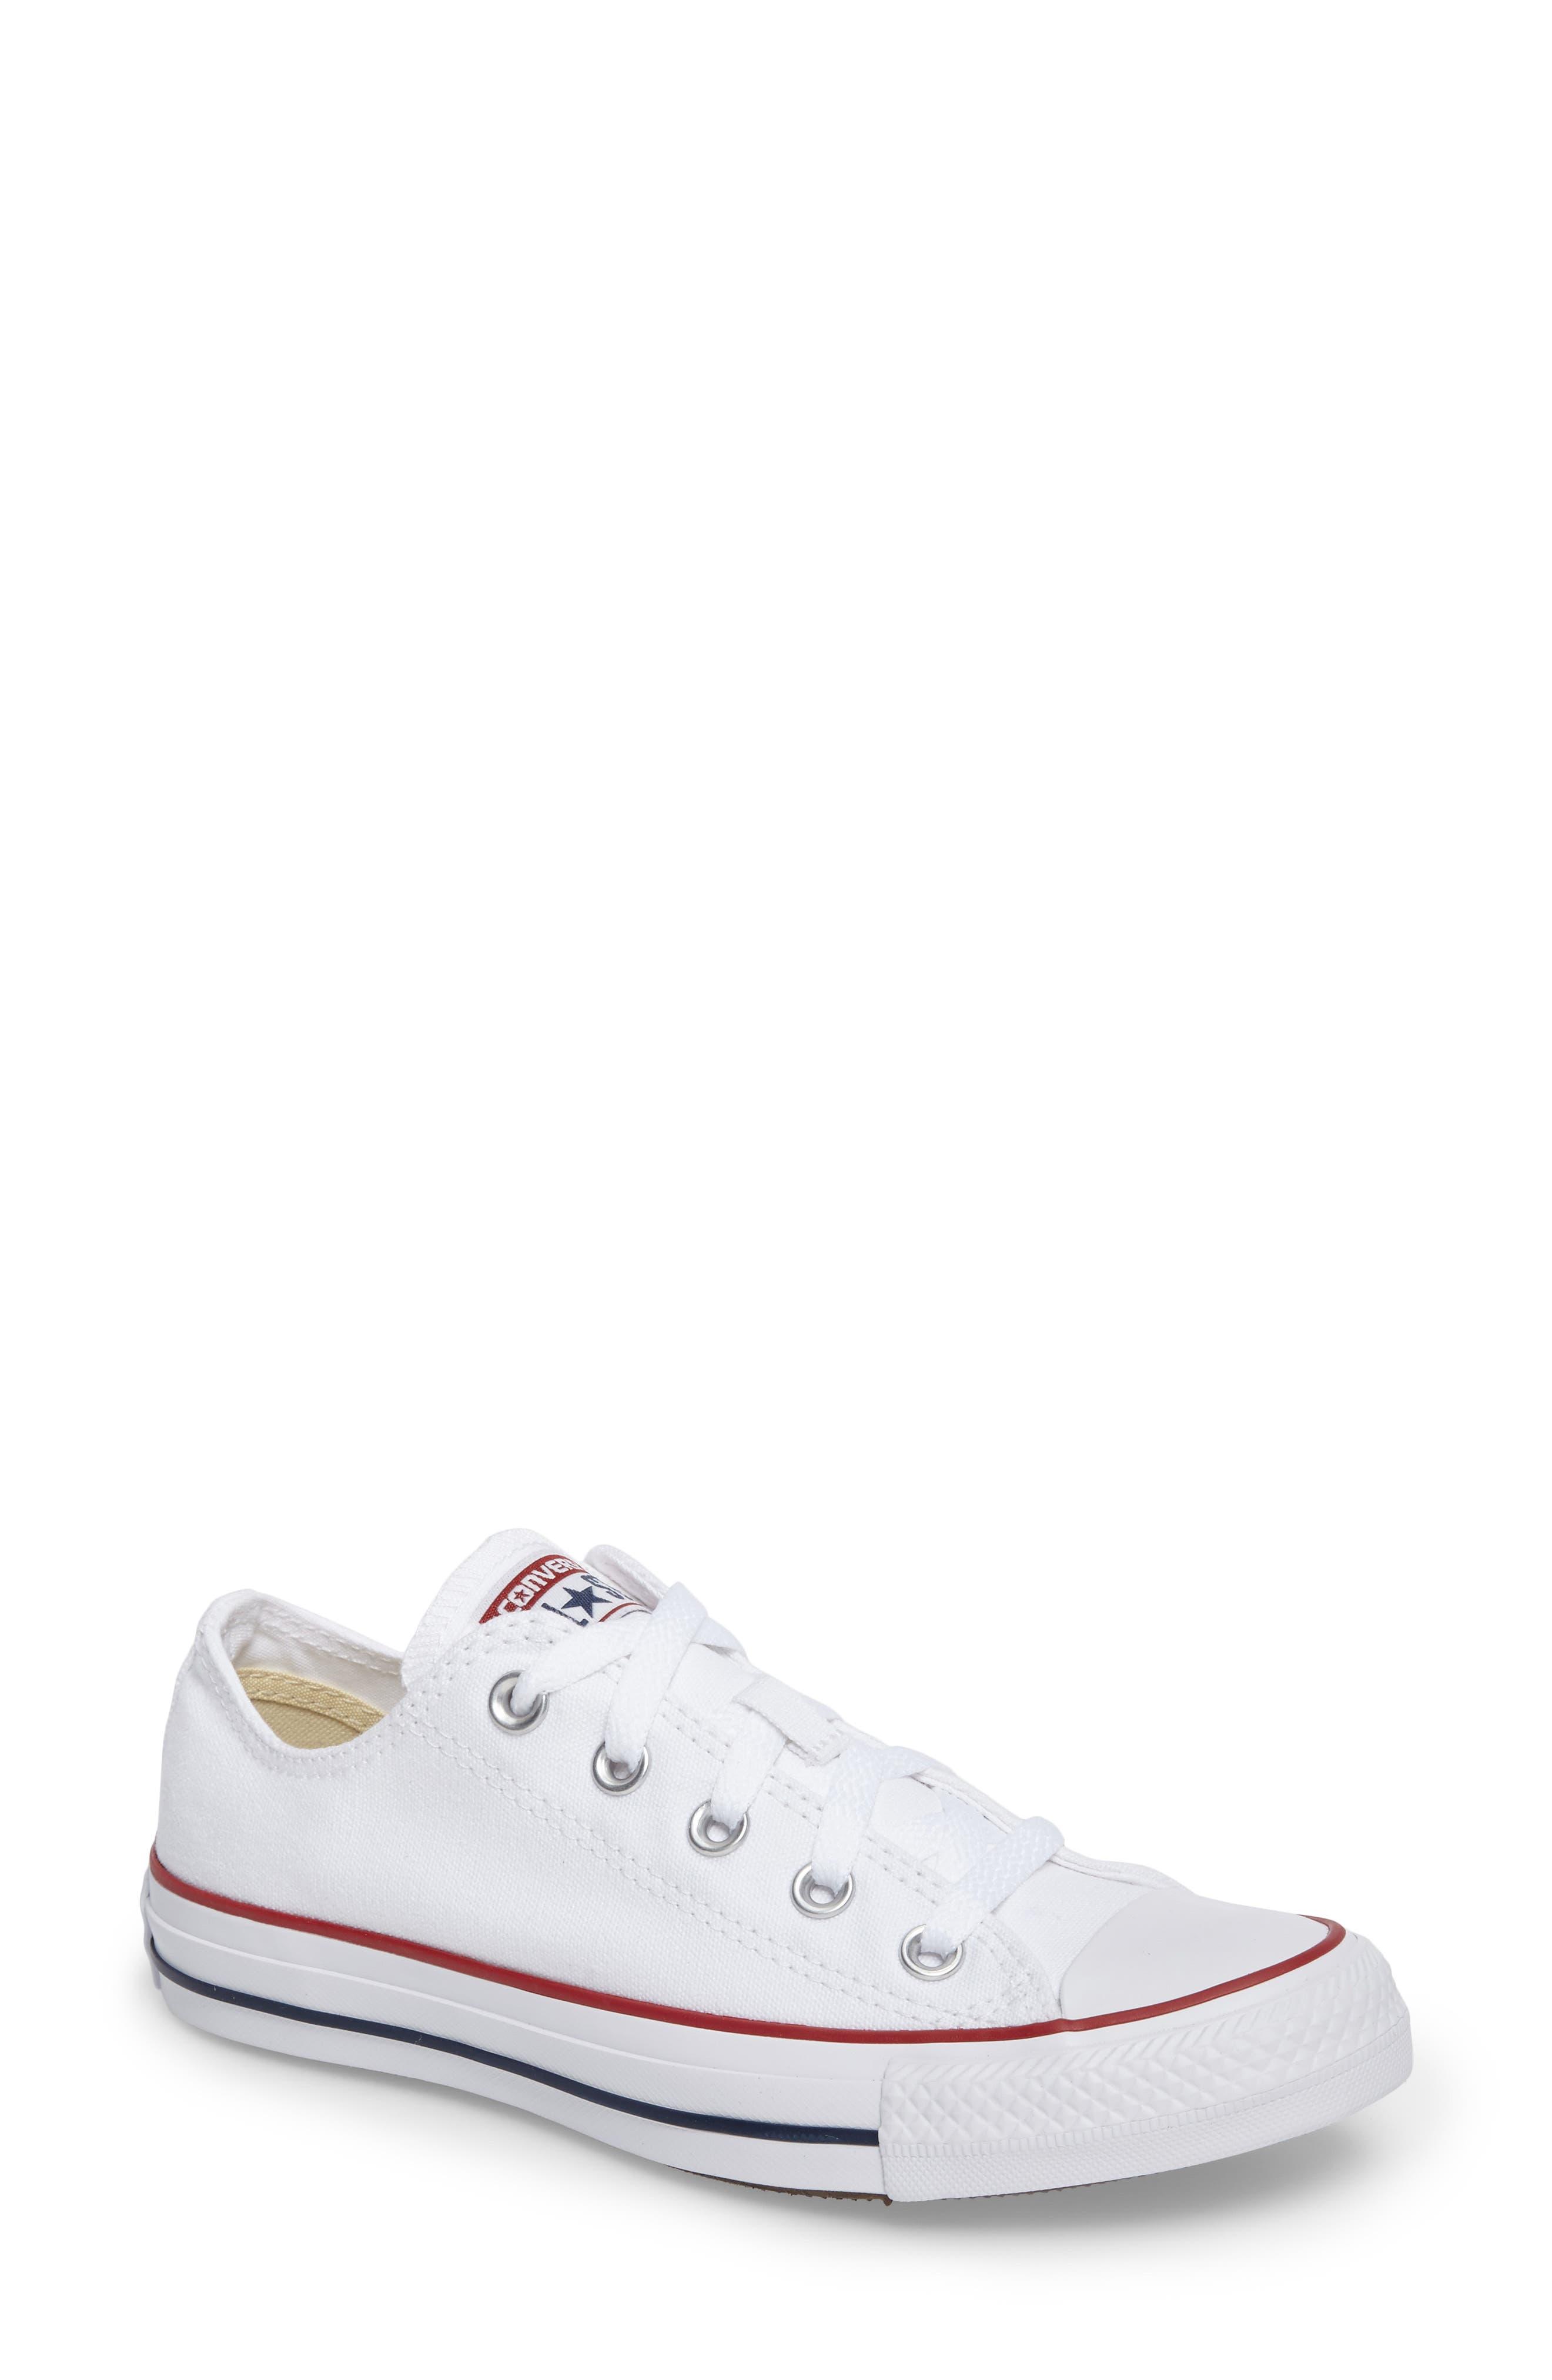 Converse Chuck Taylor® Low Top Sneaker (Women)